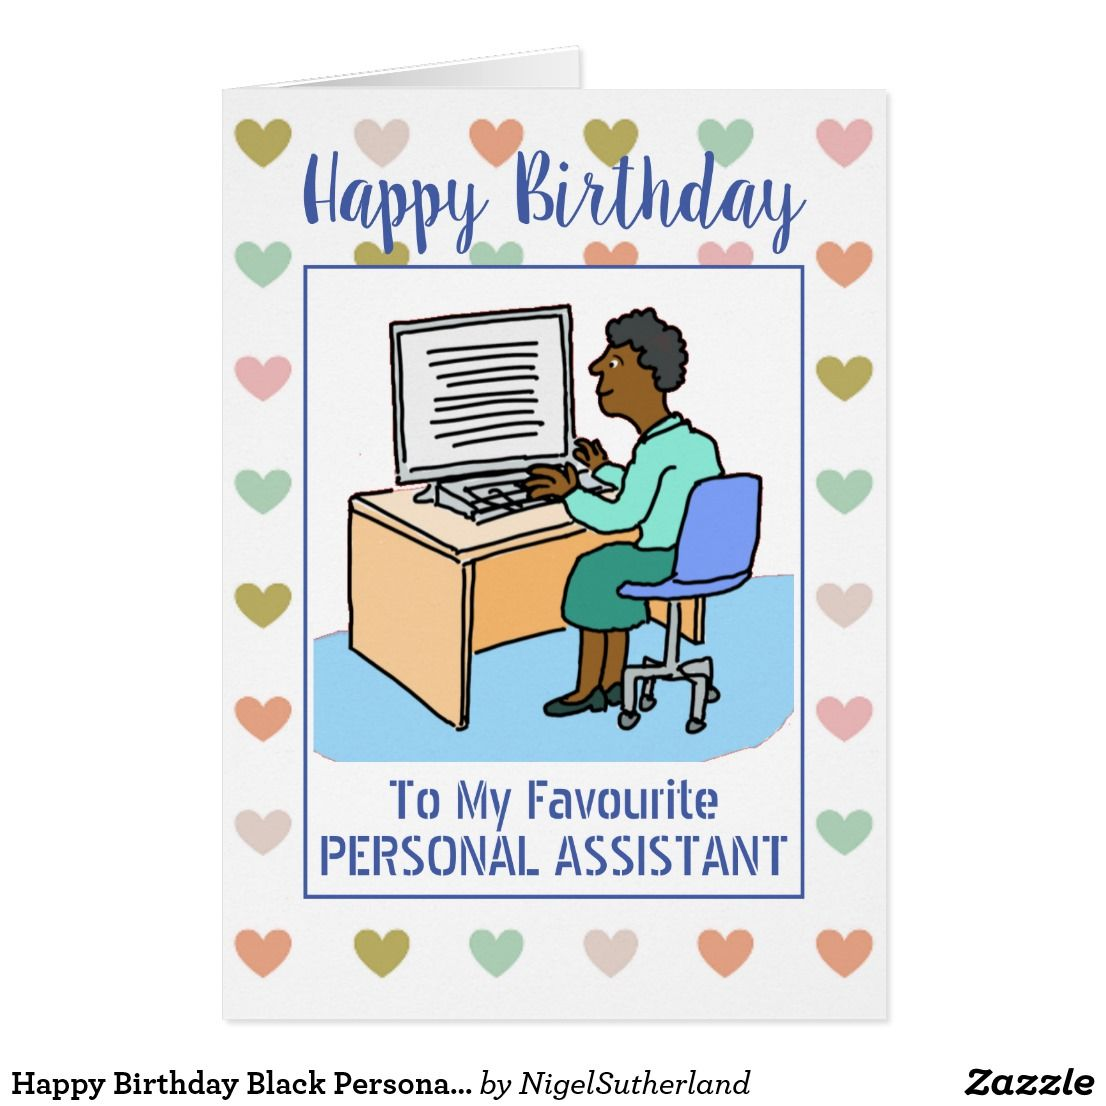 Happy Birthday Black Personal Assistant Zazzle.co.uk